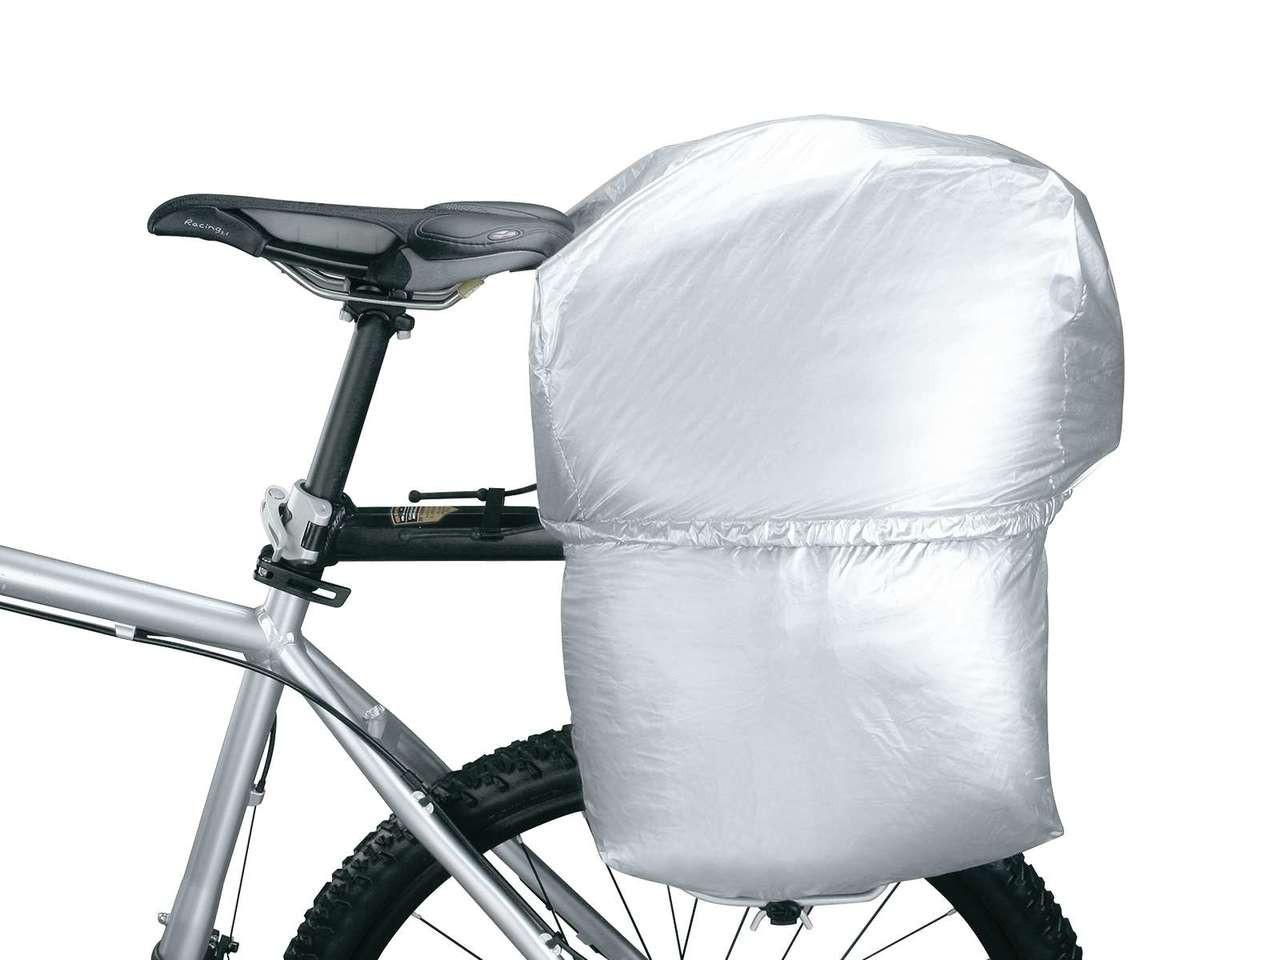 TRC009 Cycle Trunk Bag Rain Cover RX EXP /& DXP Topeak Bike